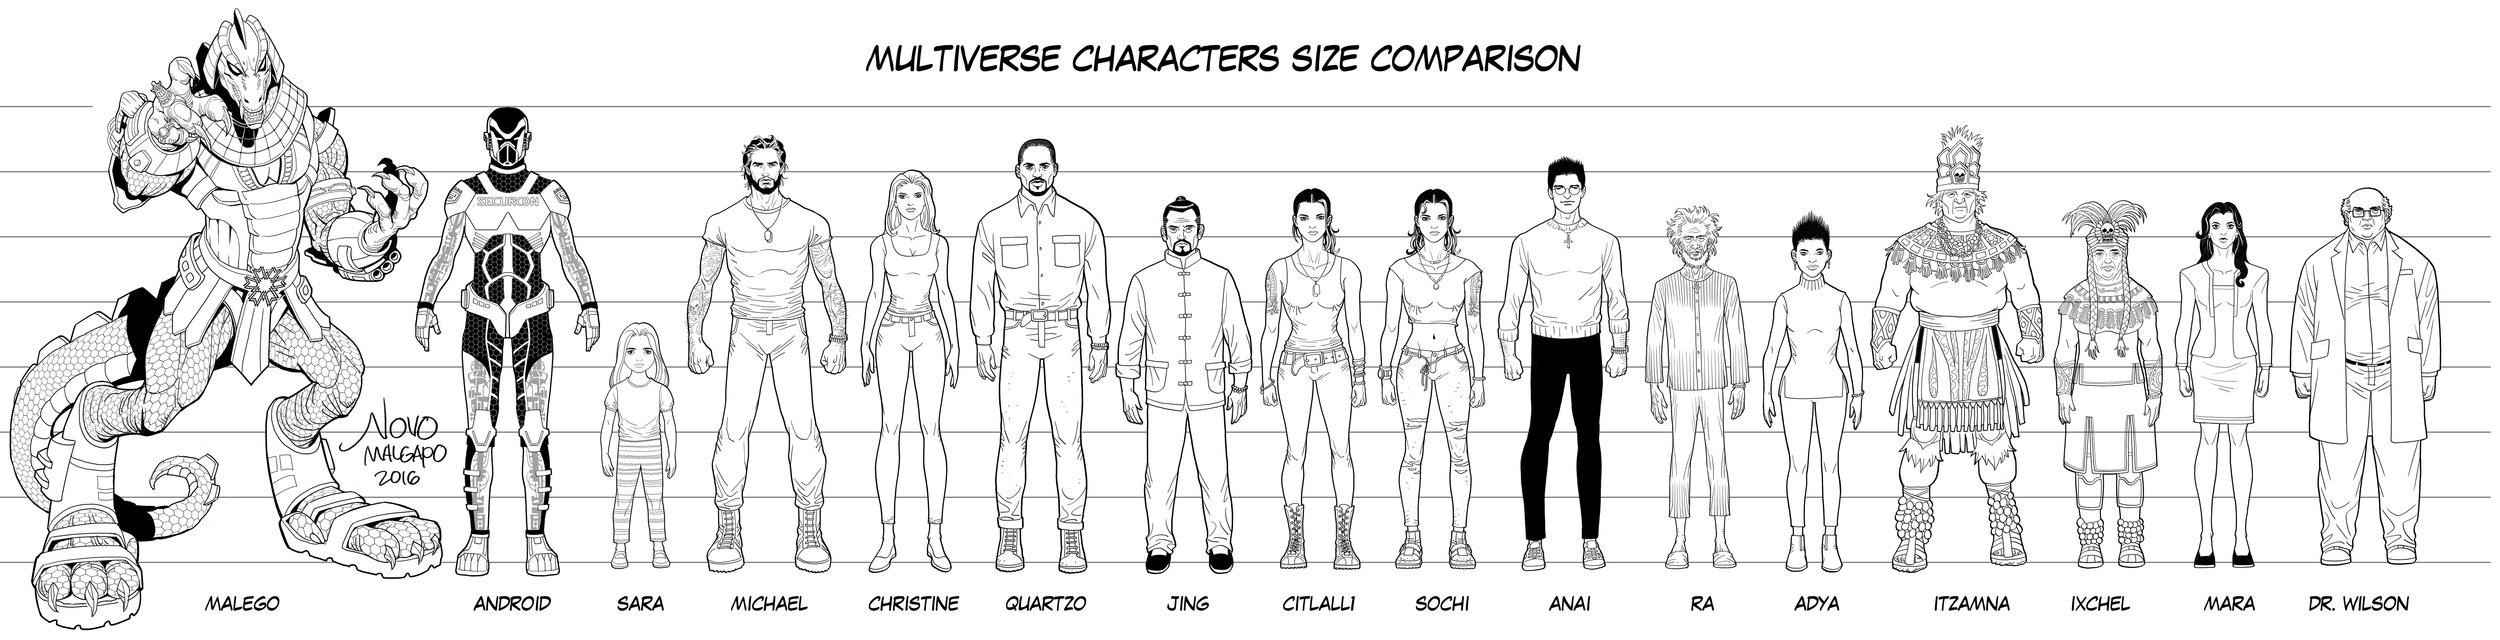 size comparison complete.jpg